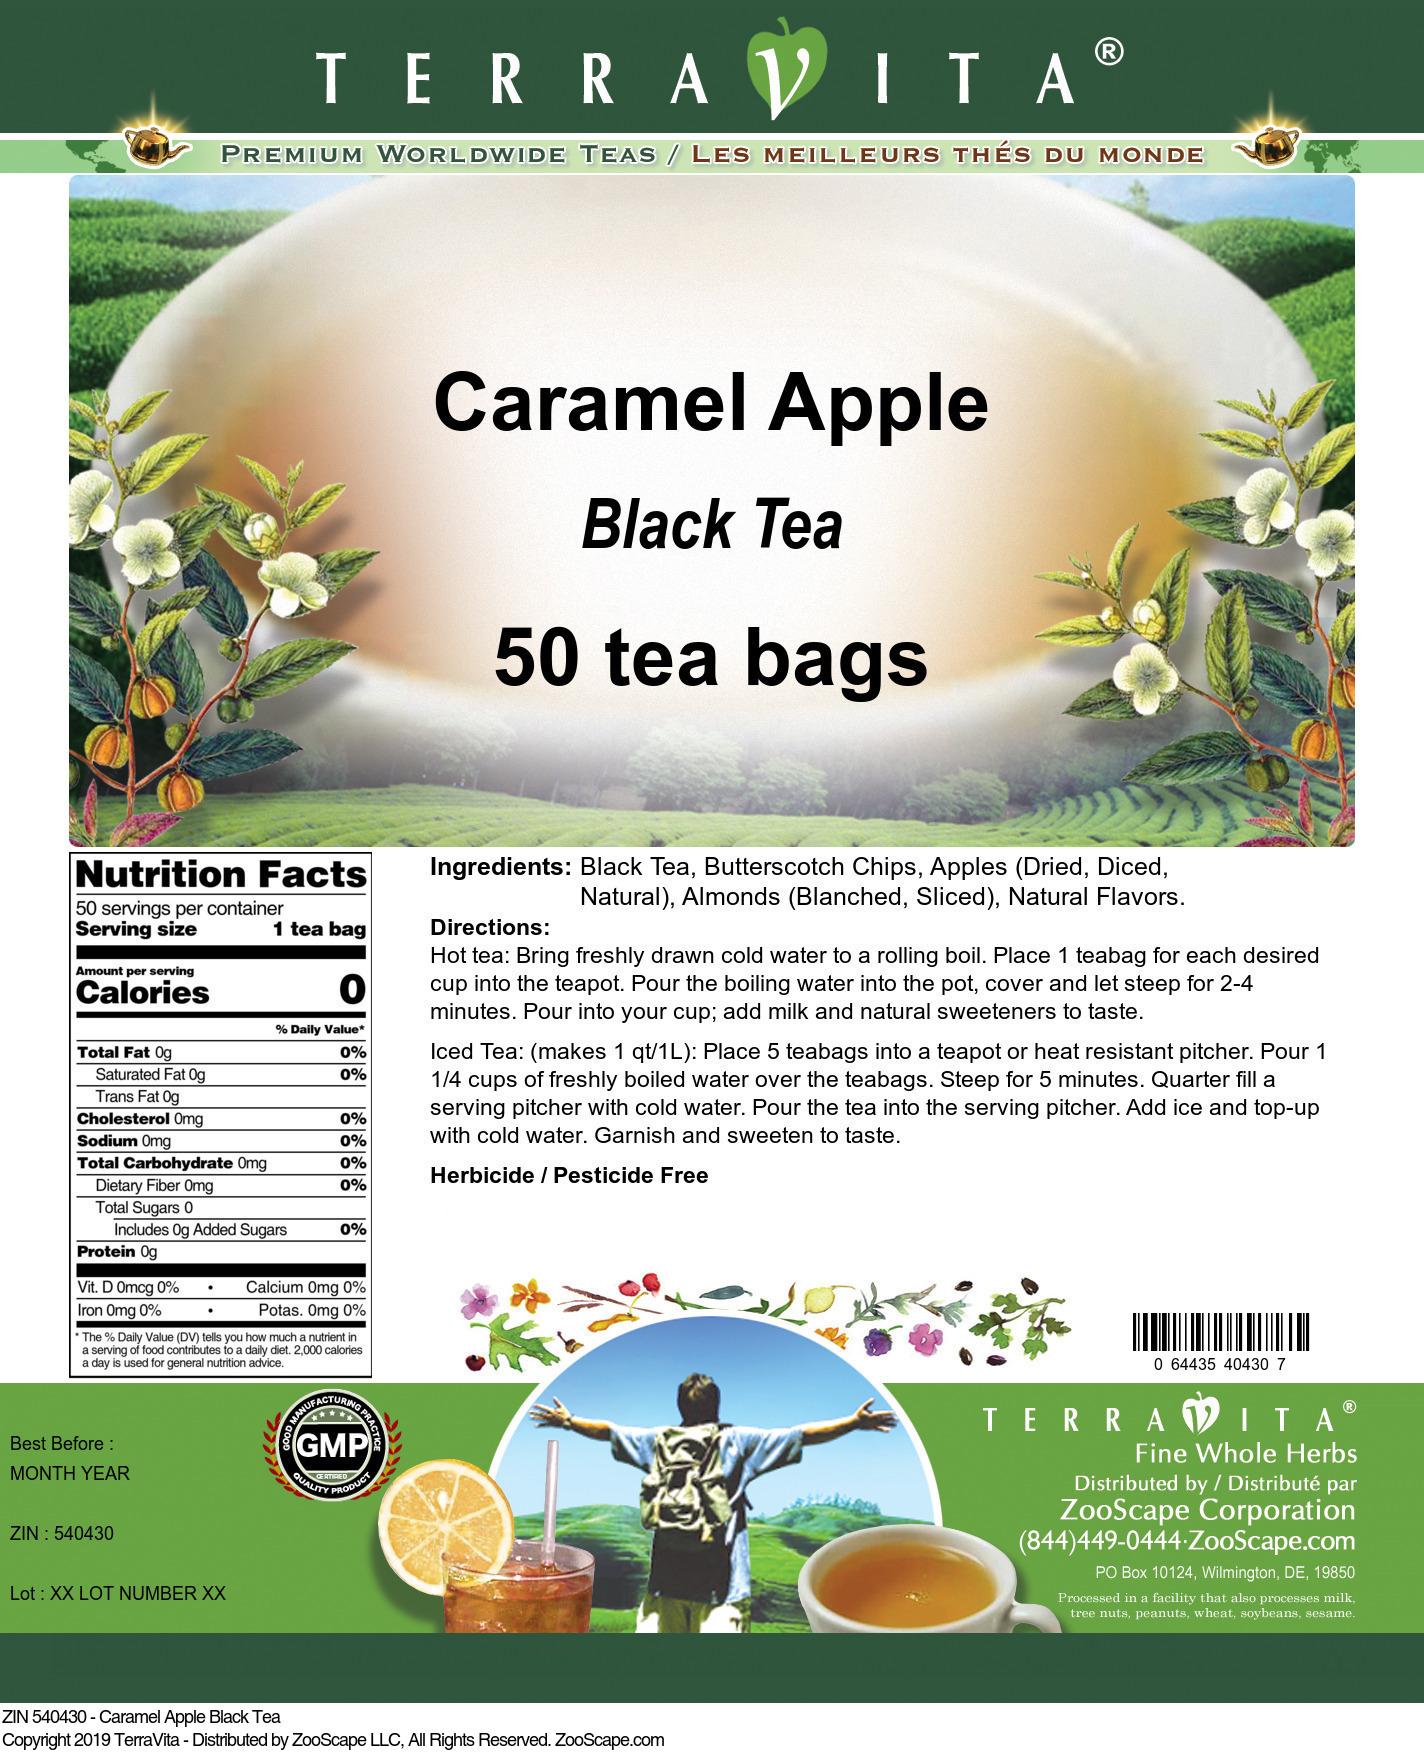 Caramel Apple Black Tea